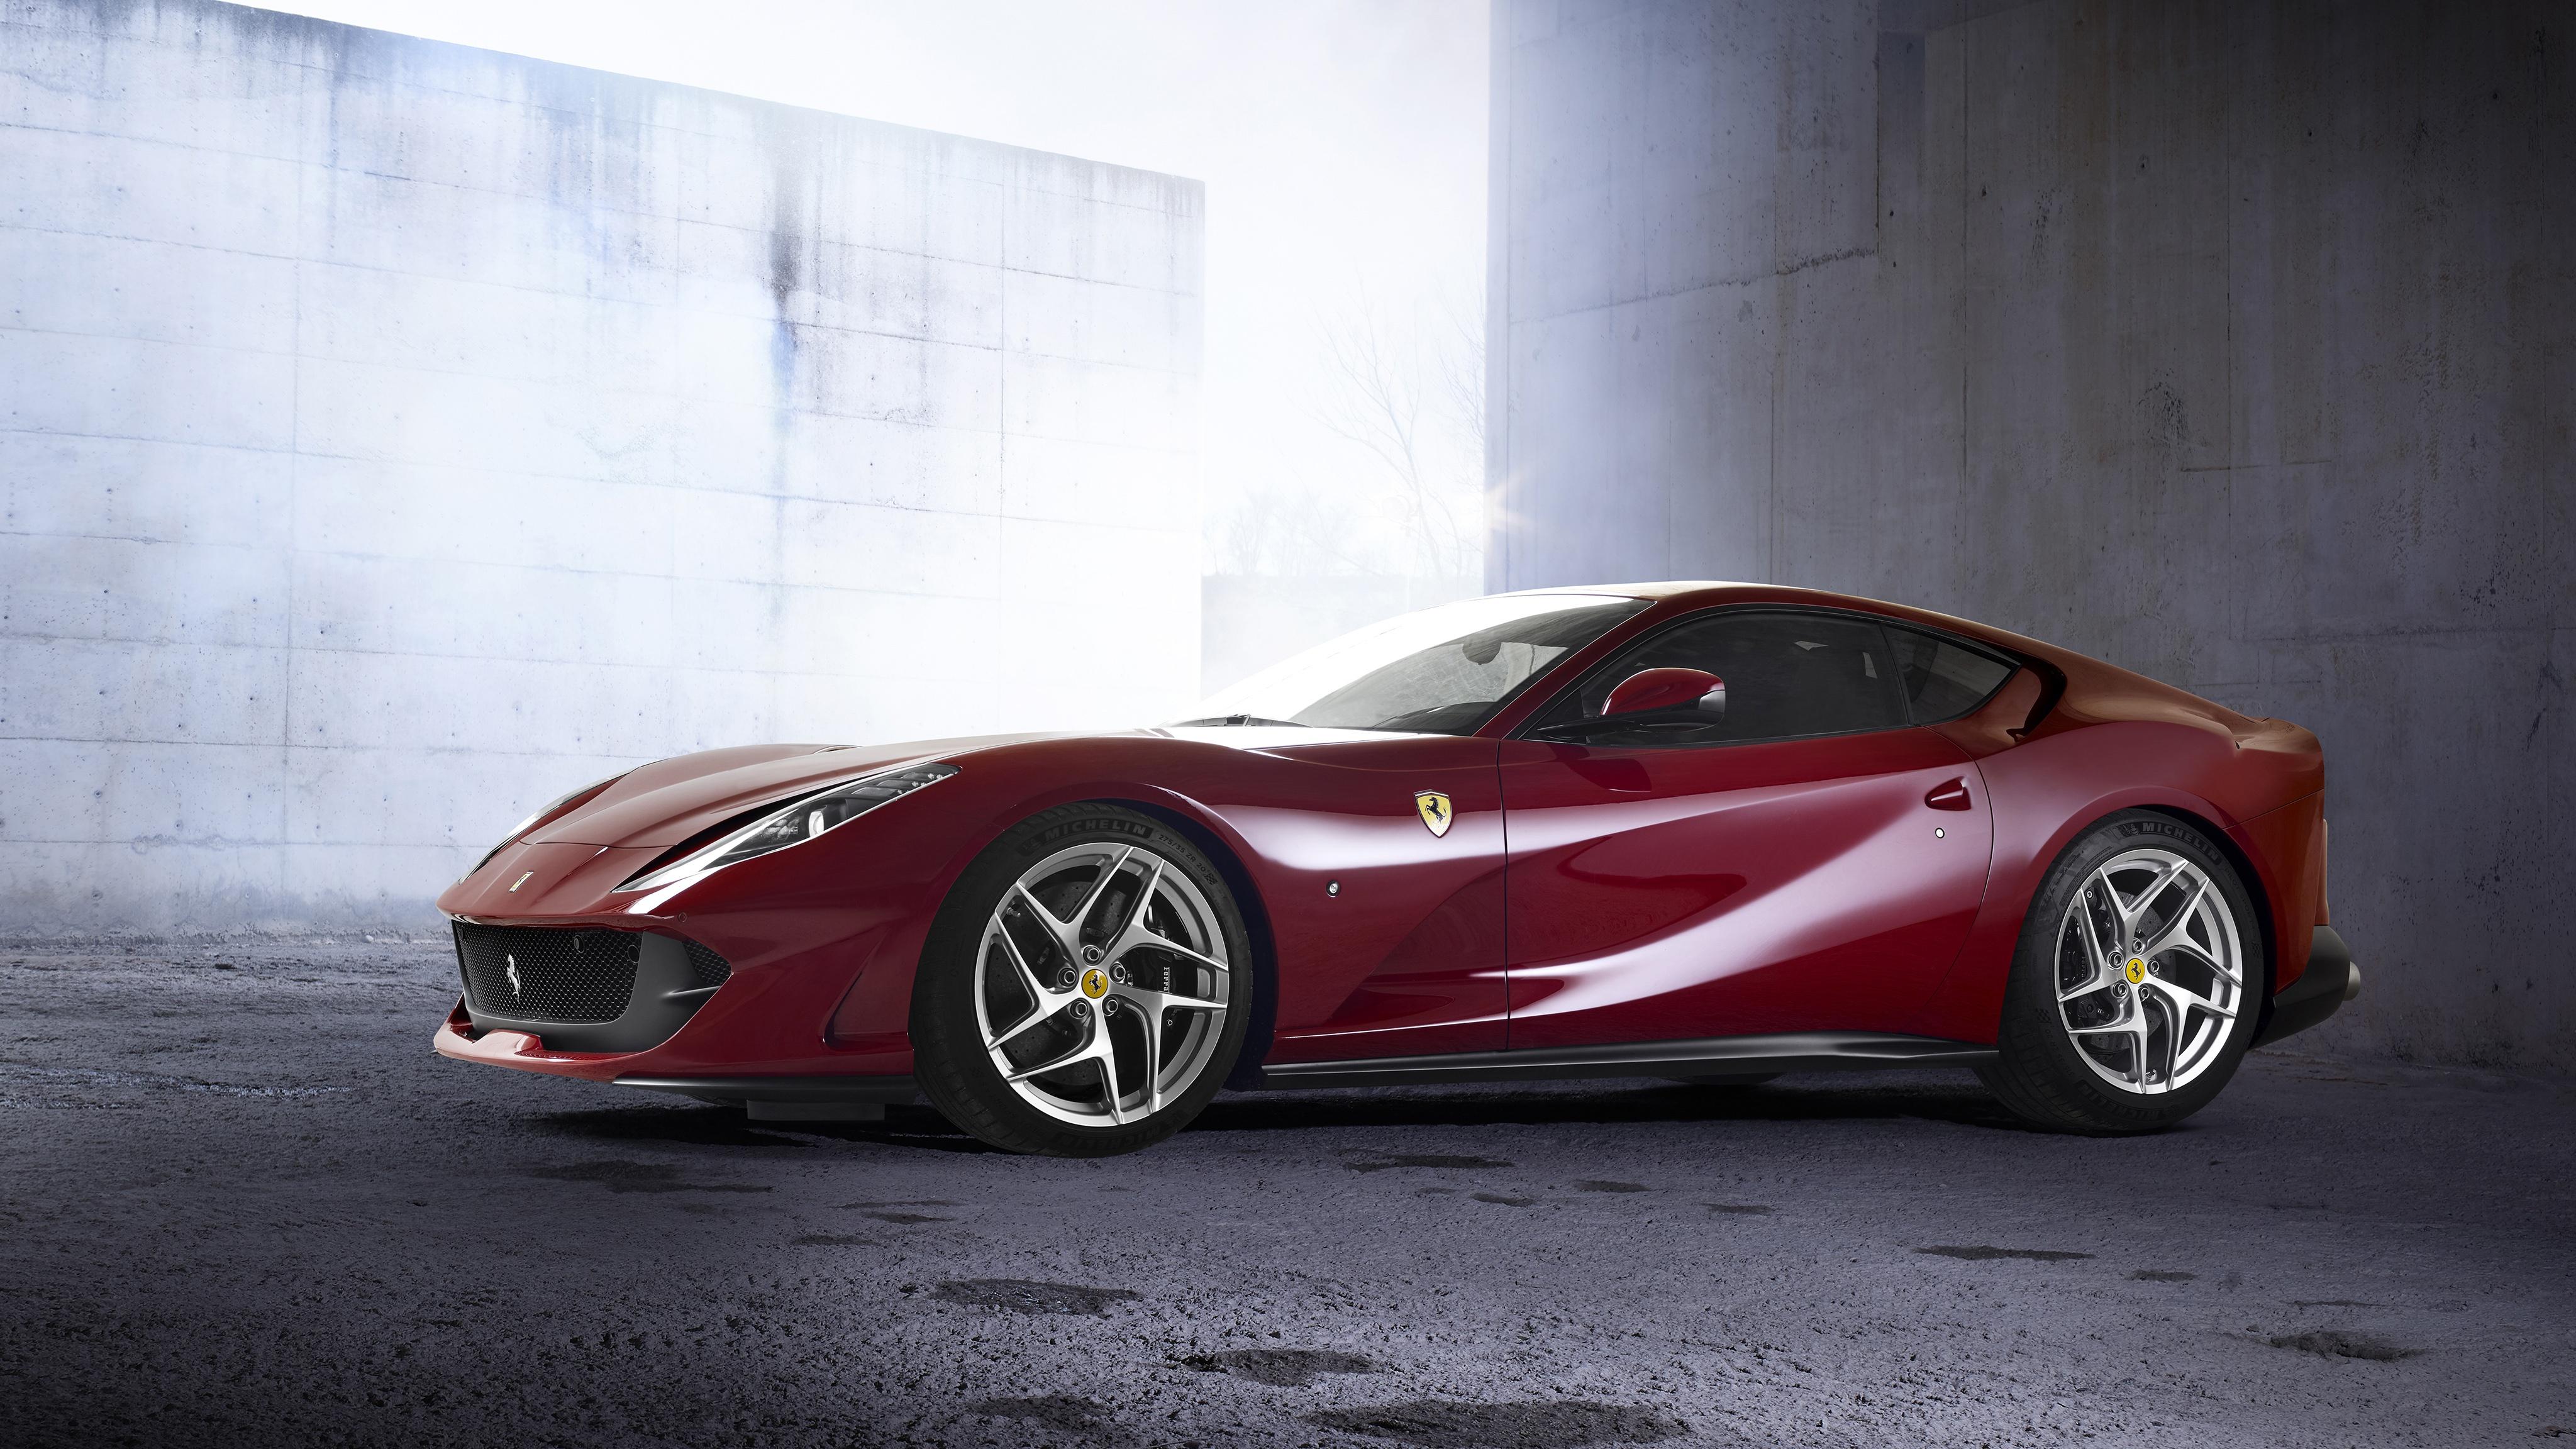 Ferrari 812 Superfast 4k Ultra HD Wallpaper   Background ...